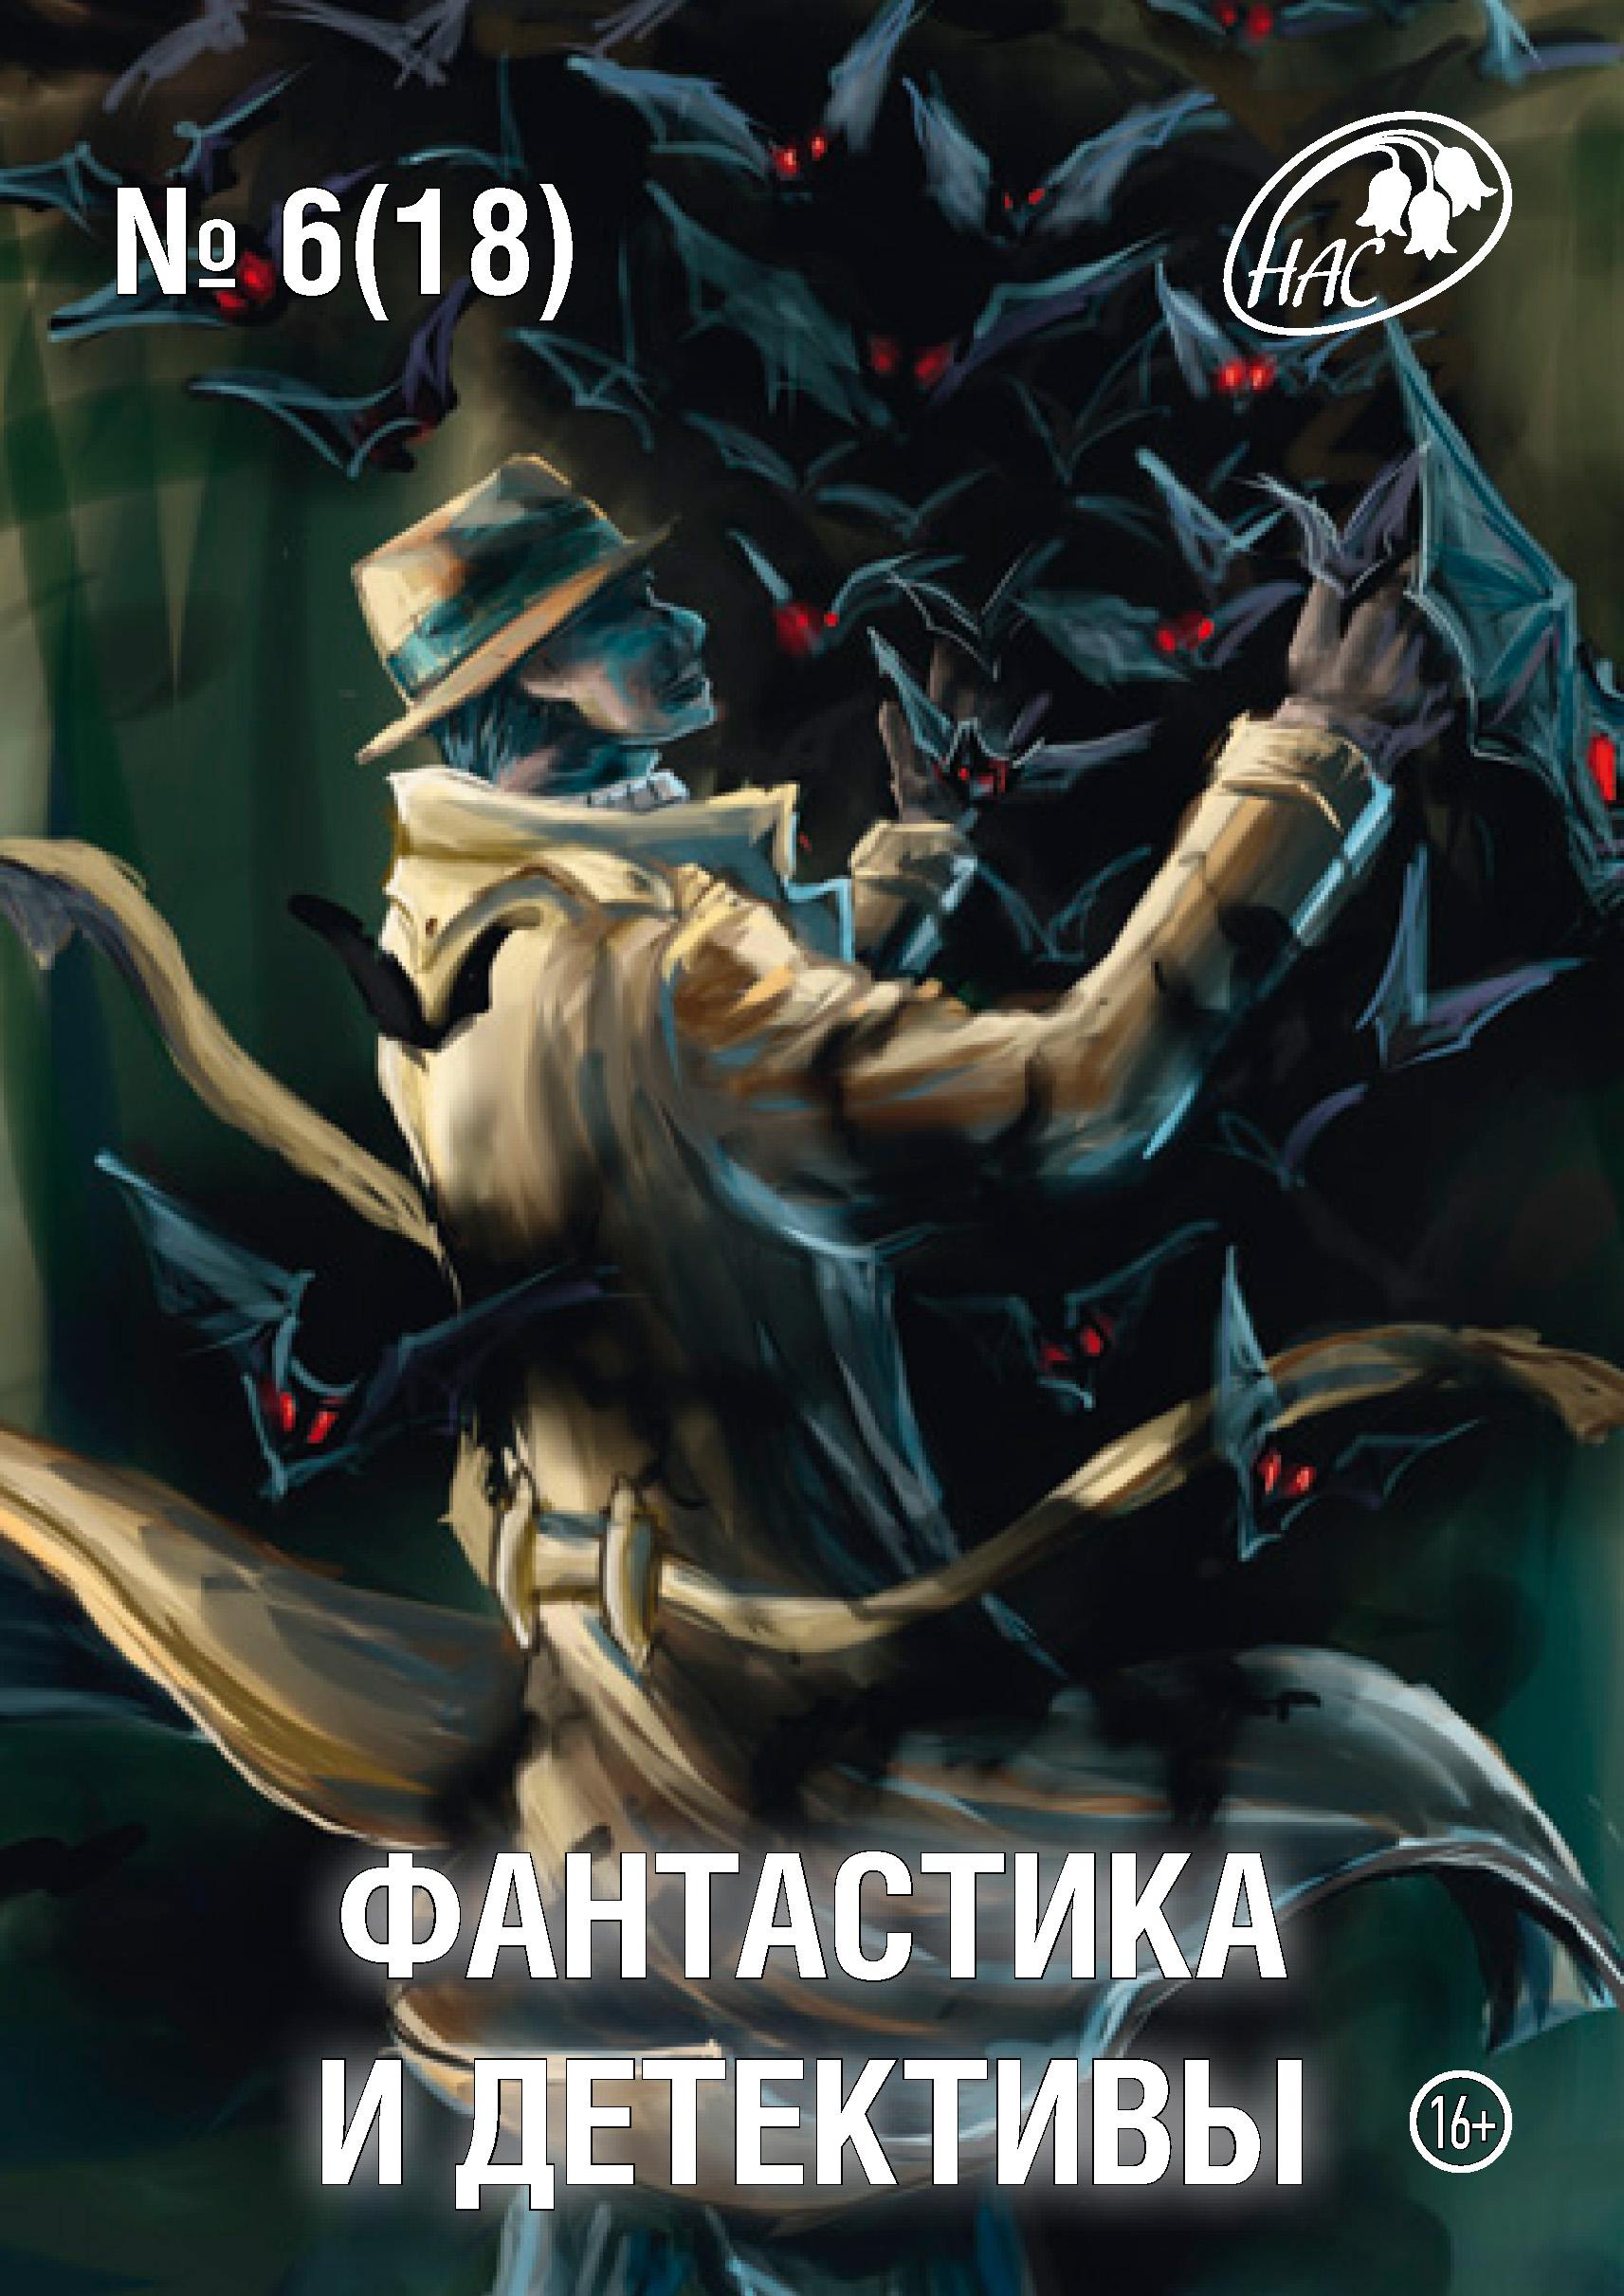 Сборник Журнал «Фантастика и Детективы» №6 (18) 2014